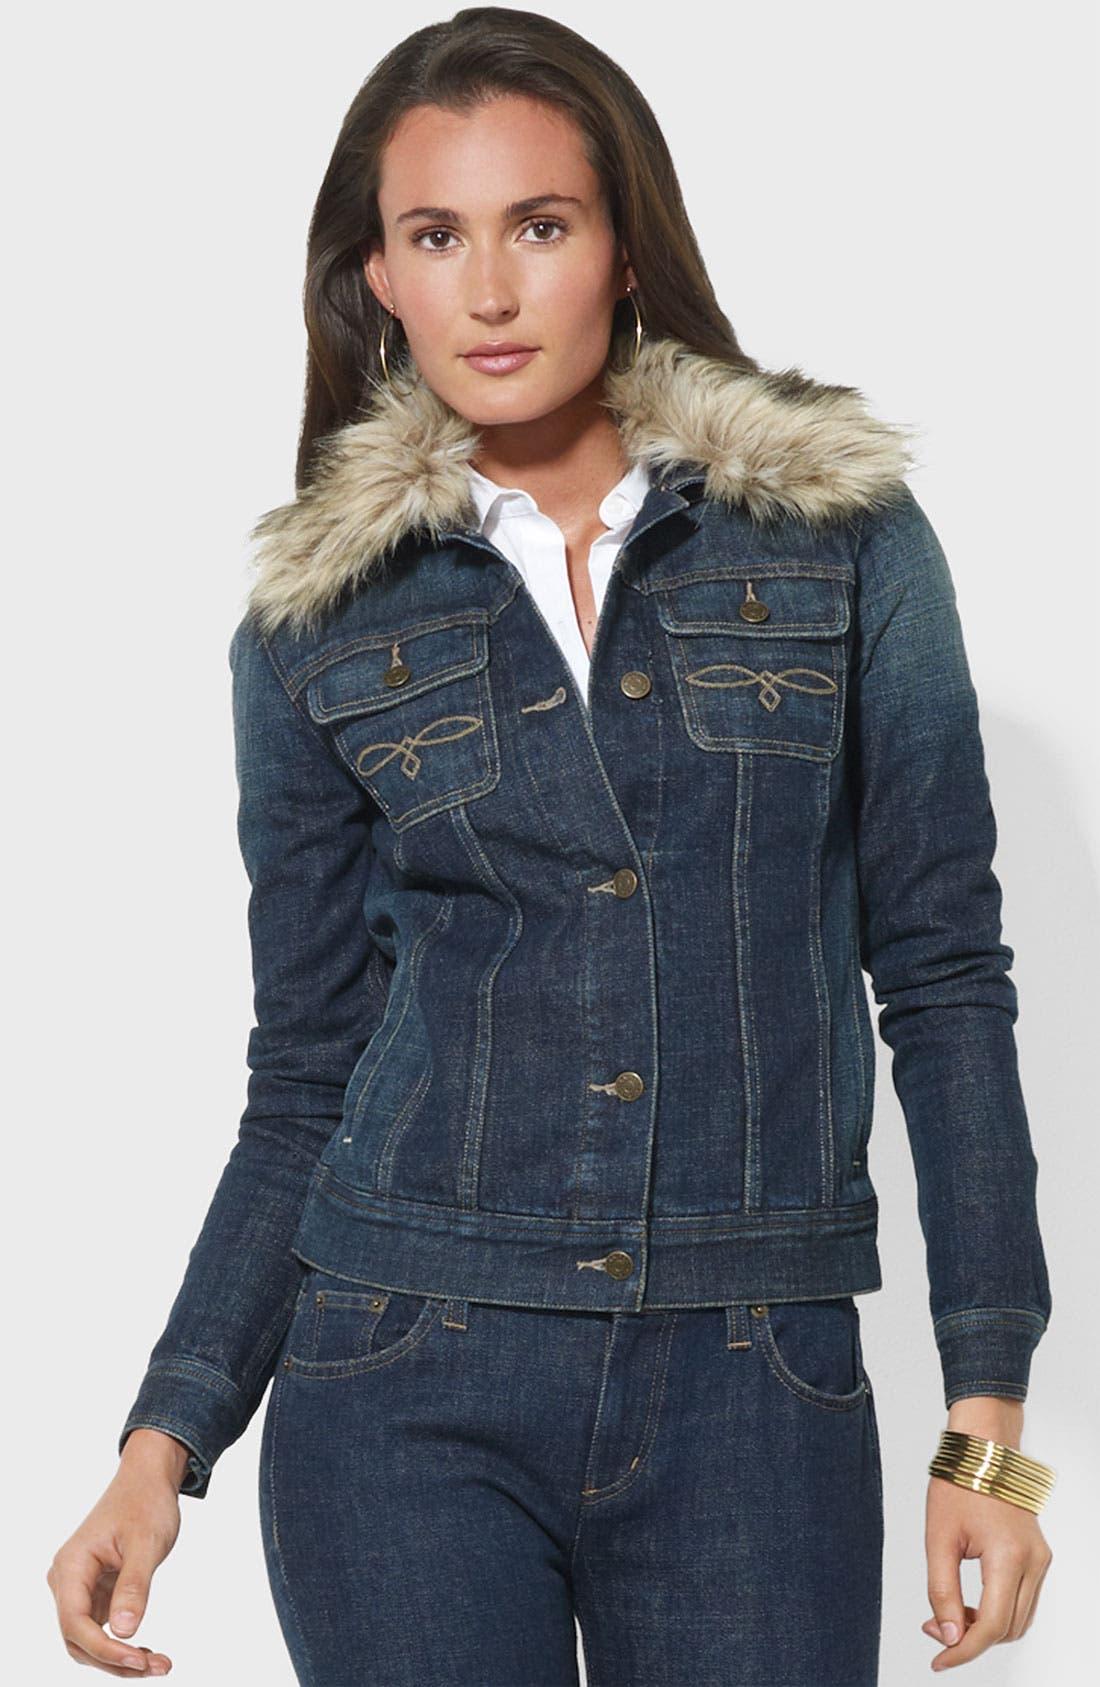 Alternate Image 1 Selected - Lauren Ralph Lauren Faux Fur Trim Denim Jacket